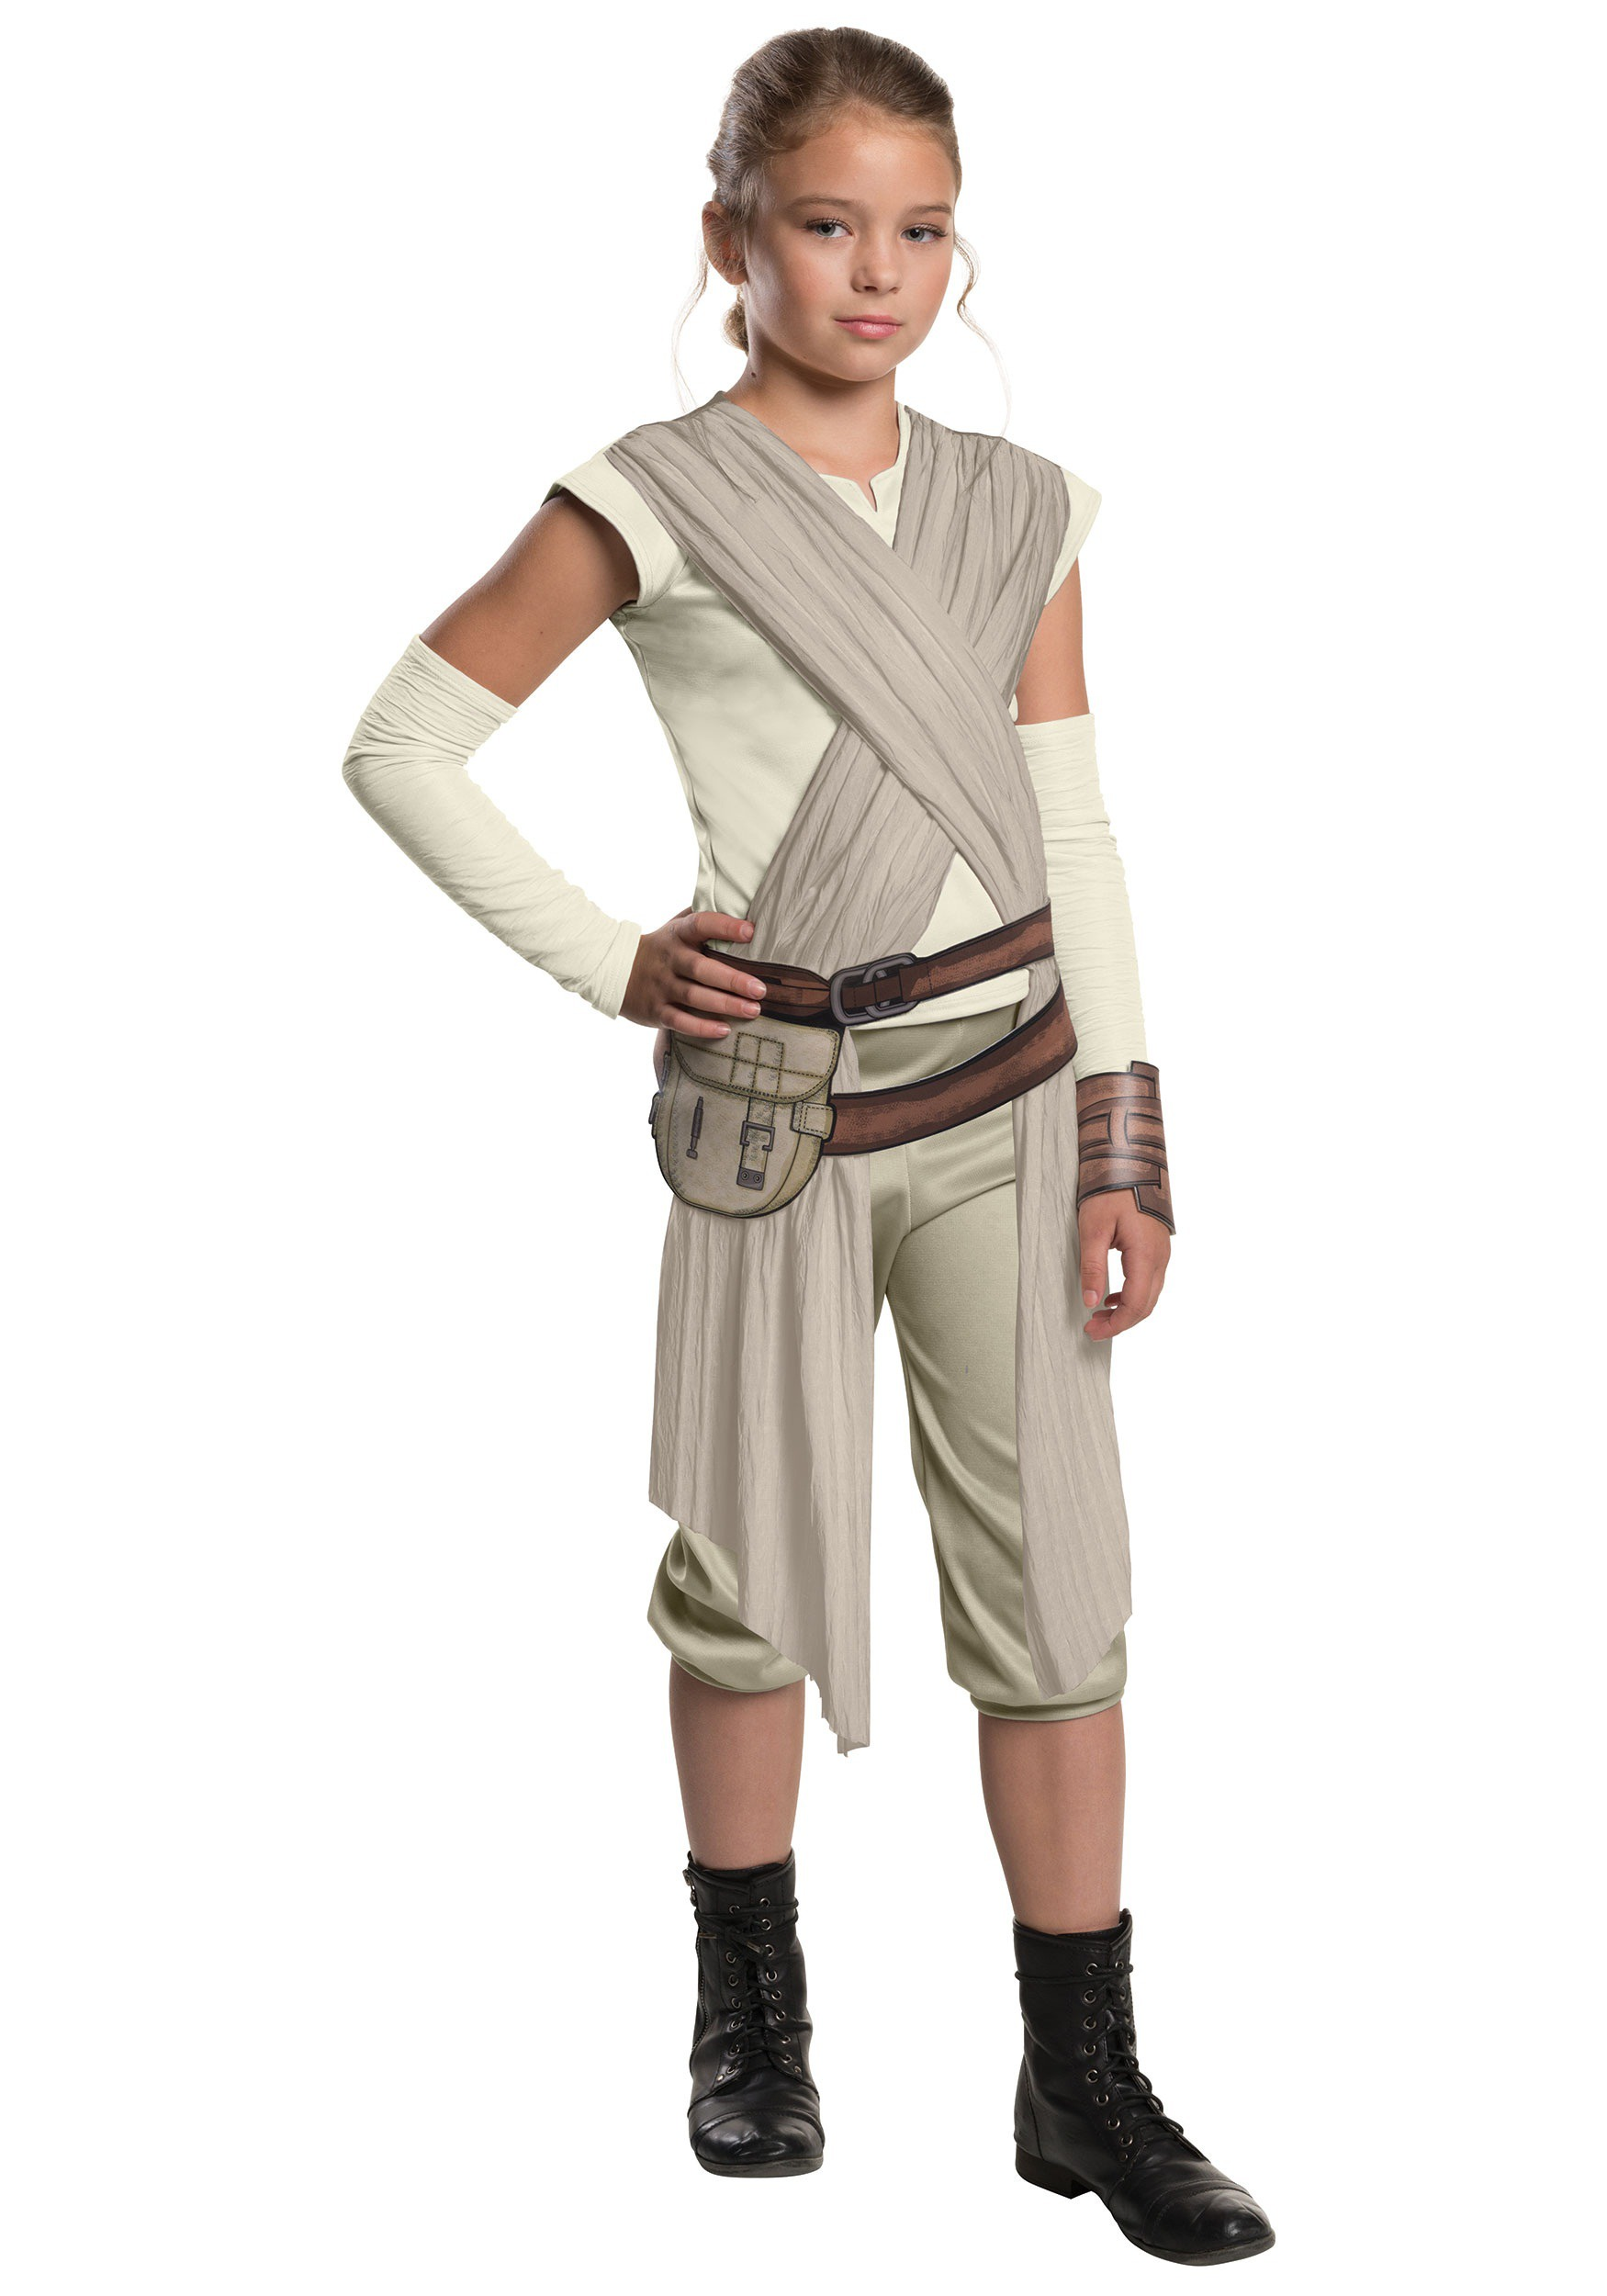 Star Wars Costume 7